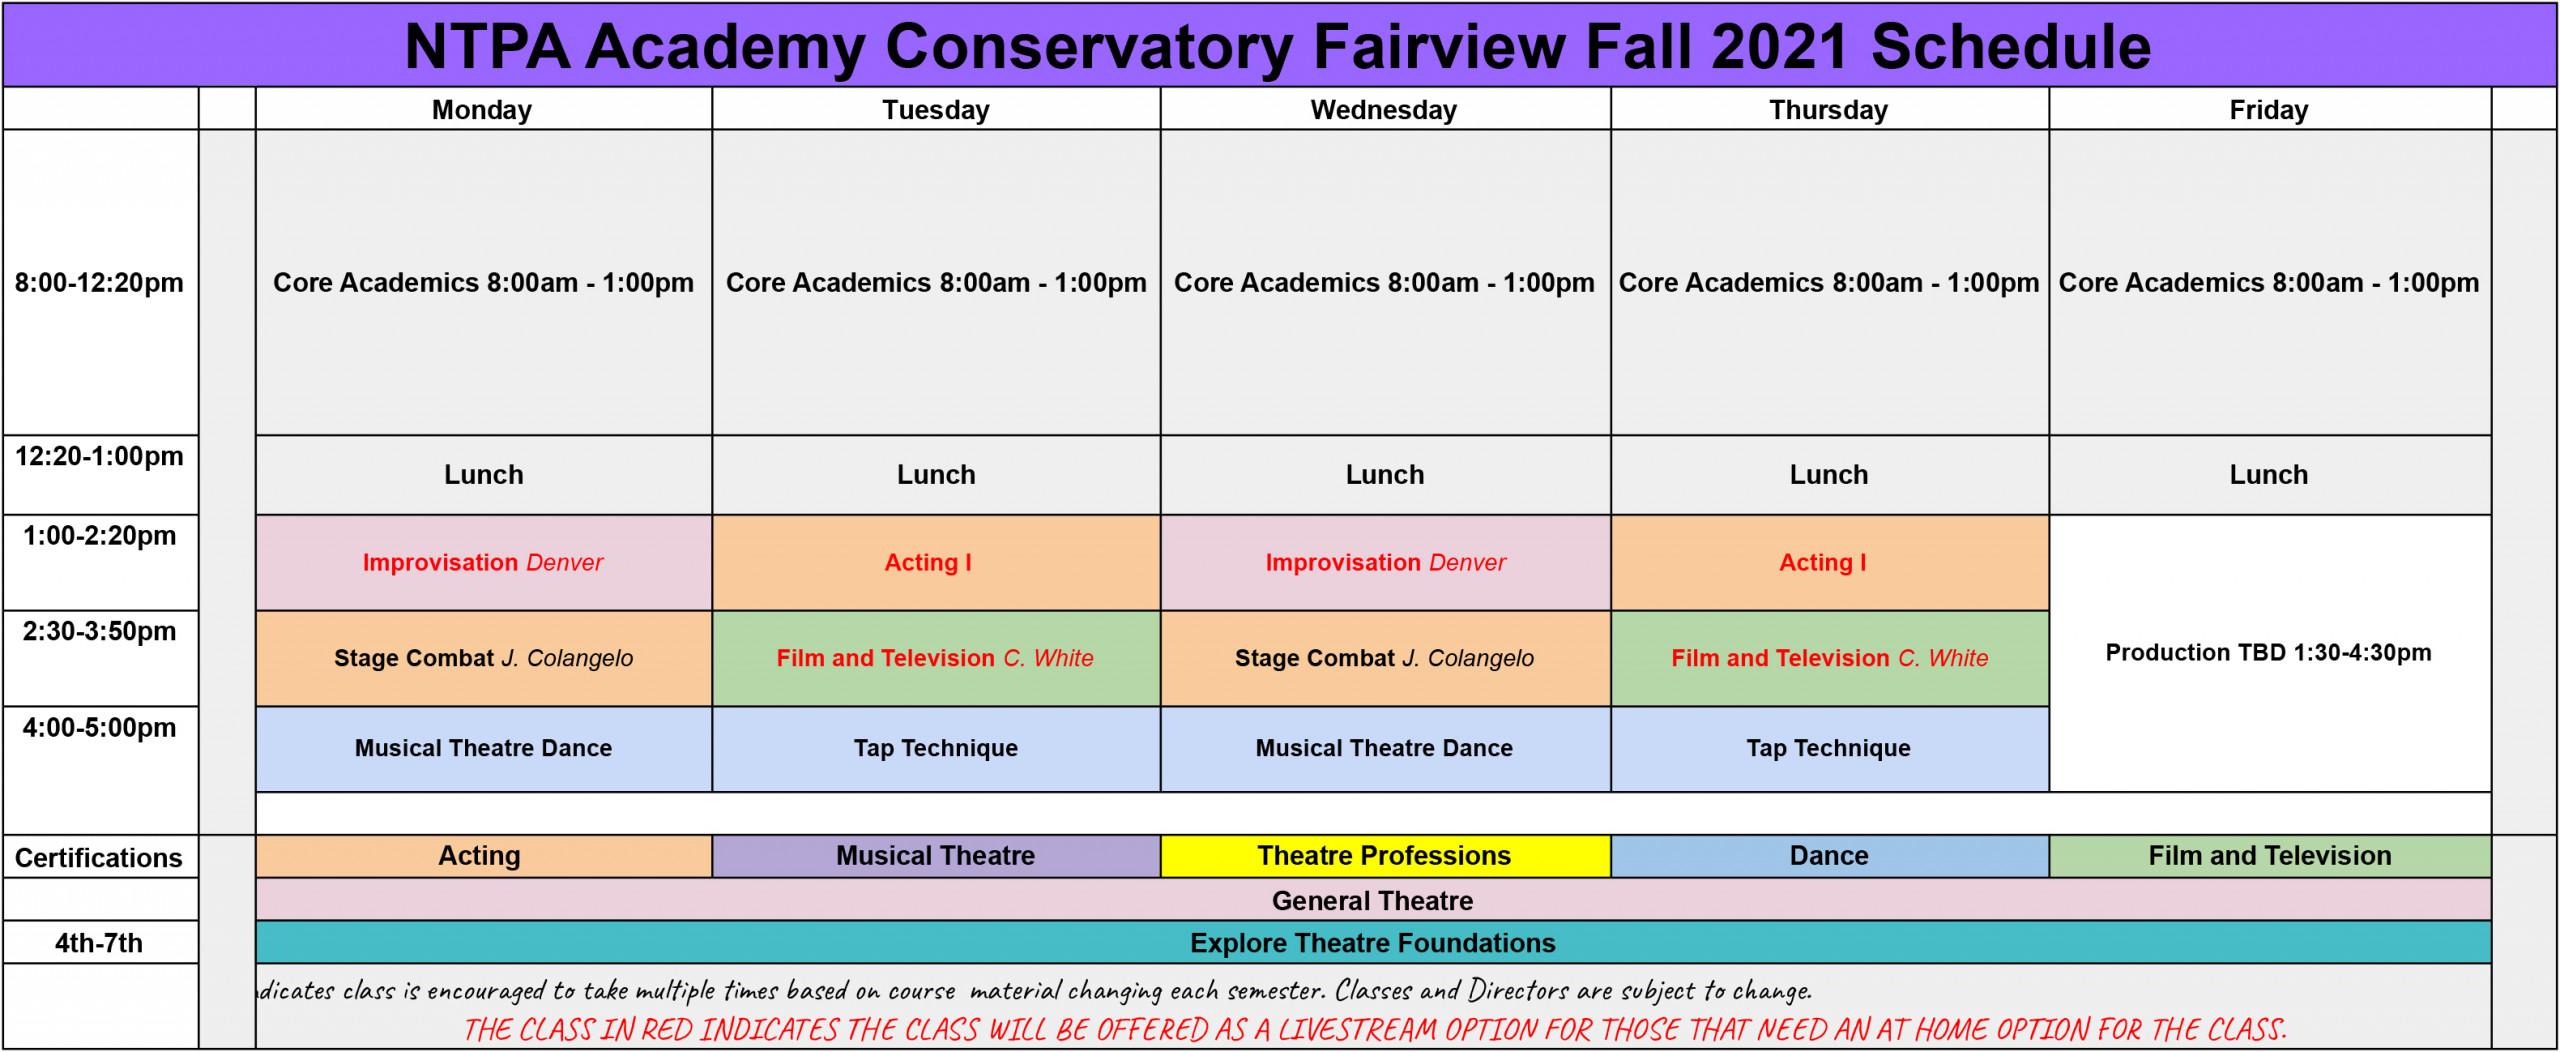 NTPA Academy Fall Fairview 2021 Schedule